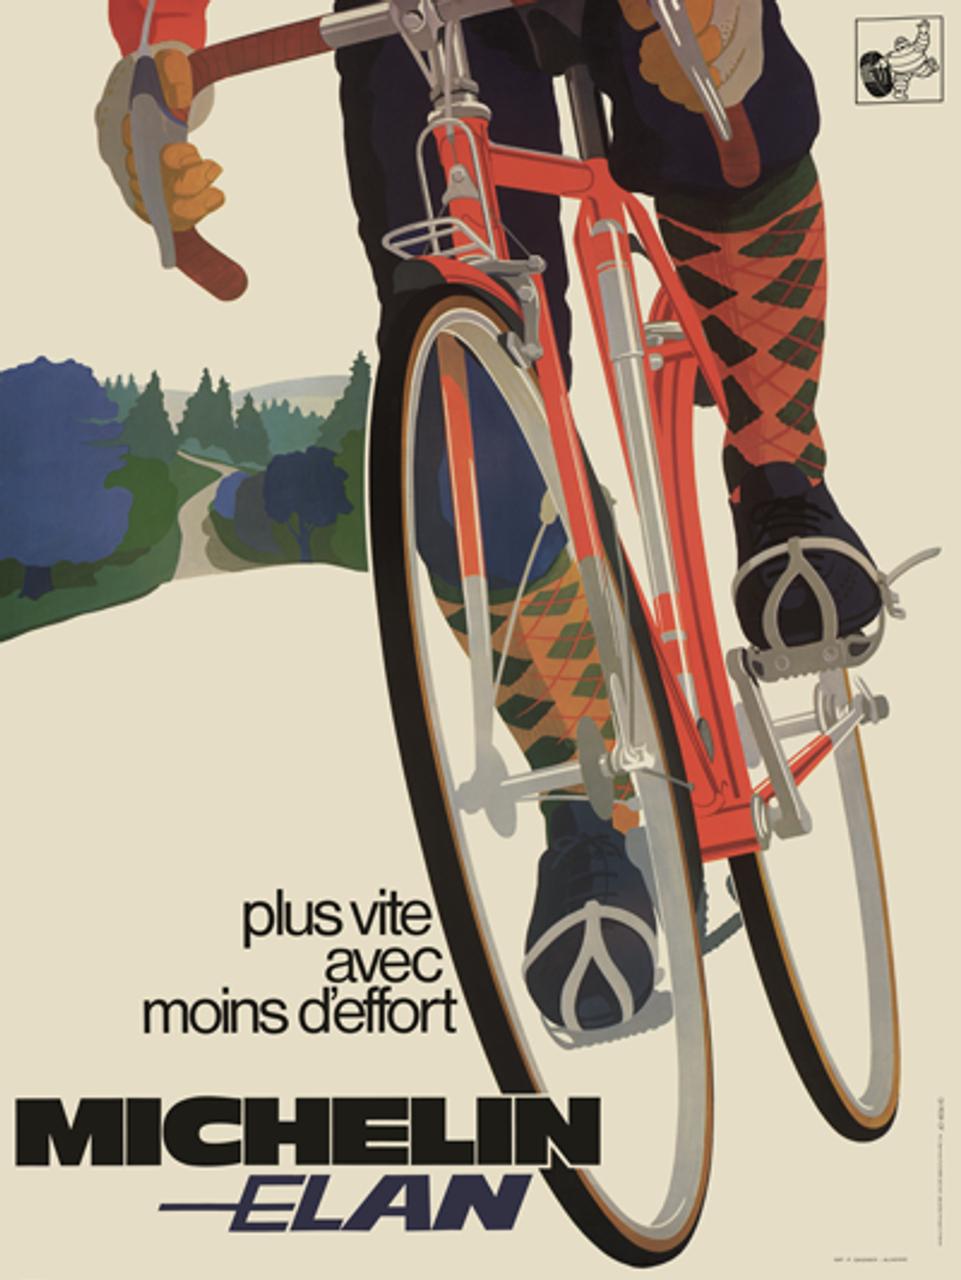 Michelin Elan Poster